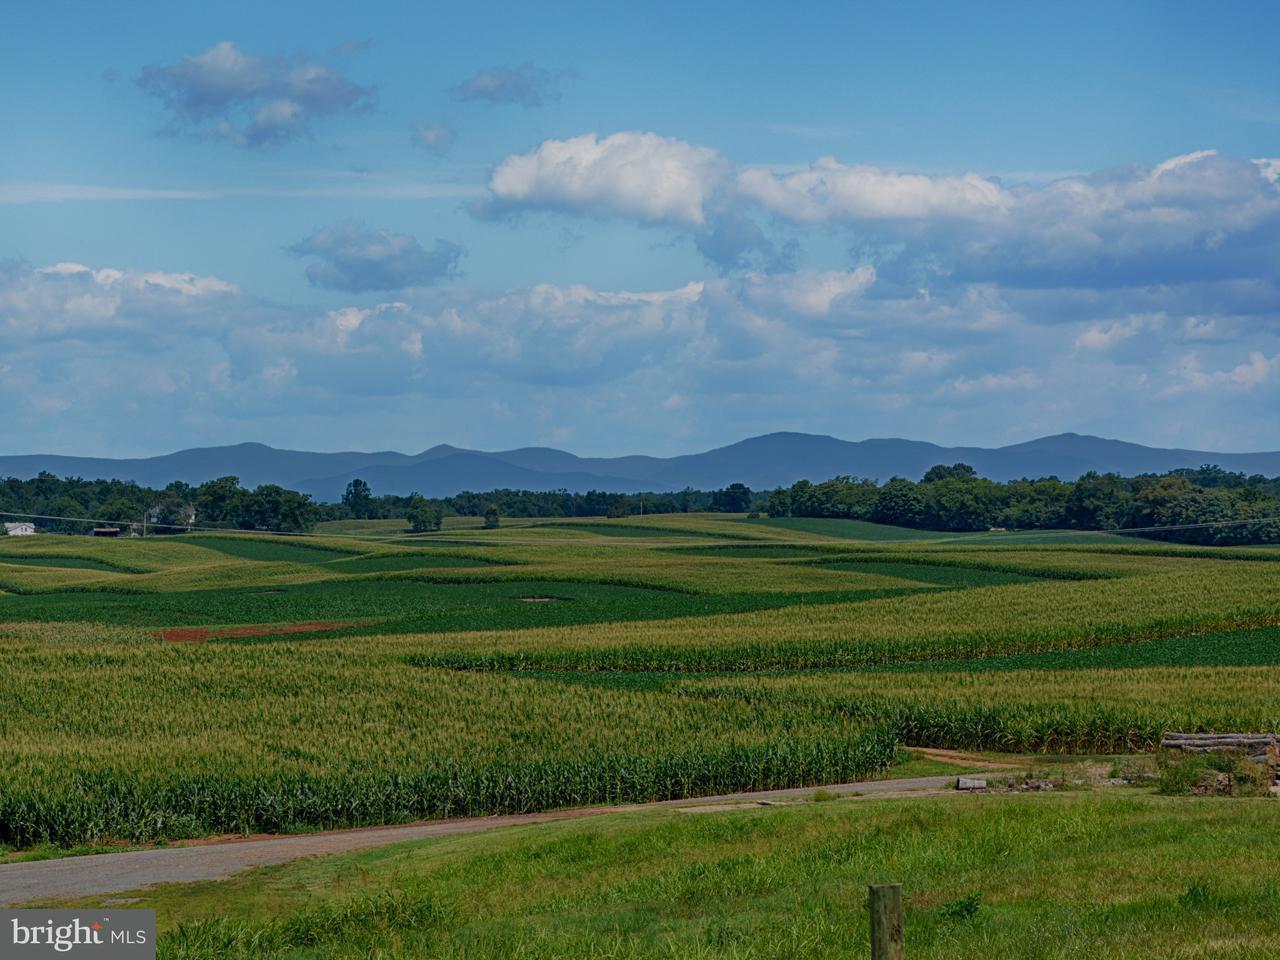 Land for Sale at 227 BLUE RIDGE TPKE 227 BLUE RIDGE TPKE Somerset, Virginia 22972 United States